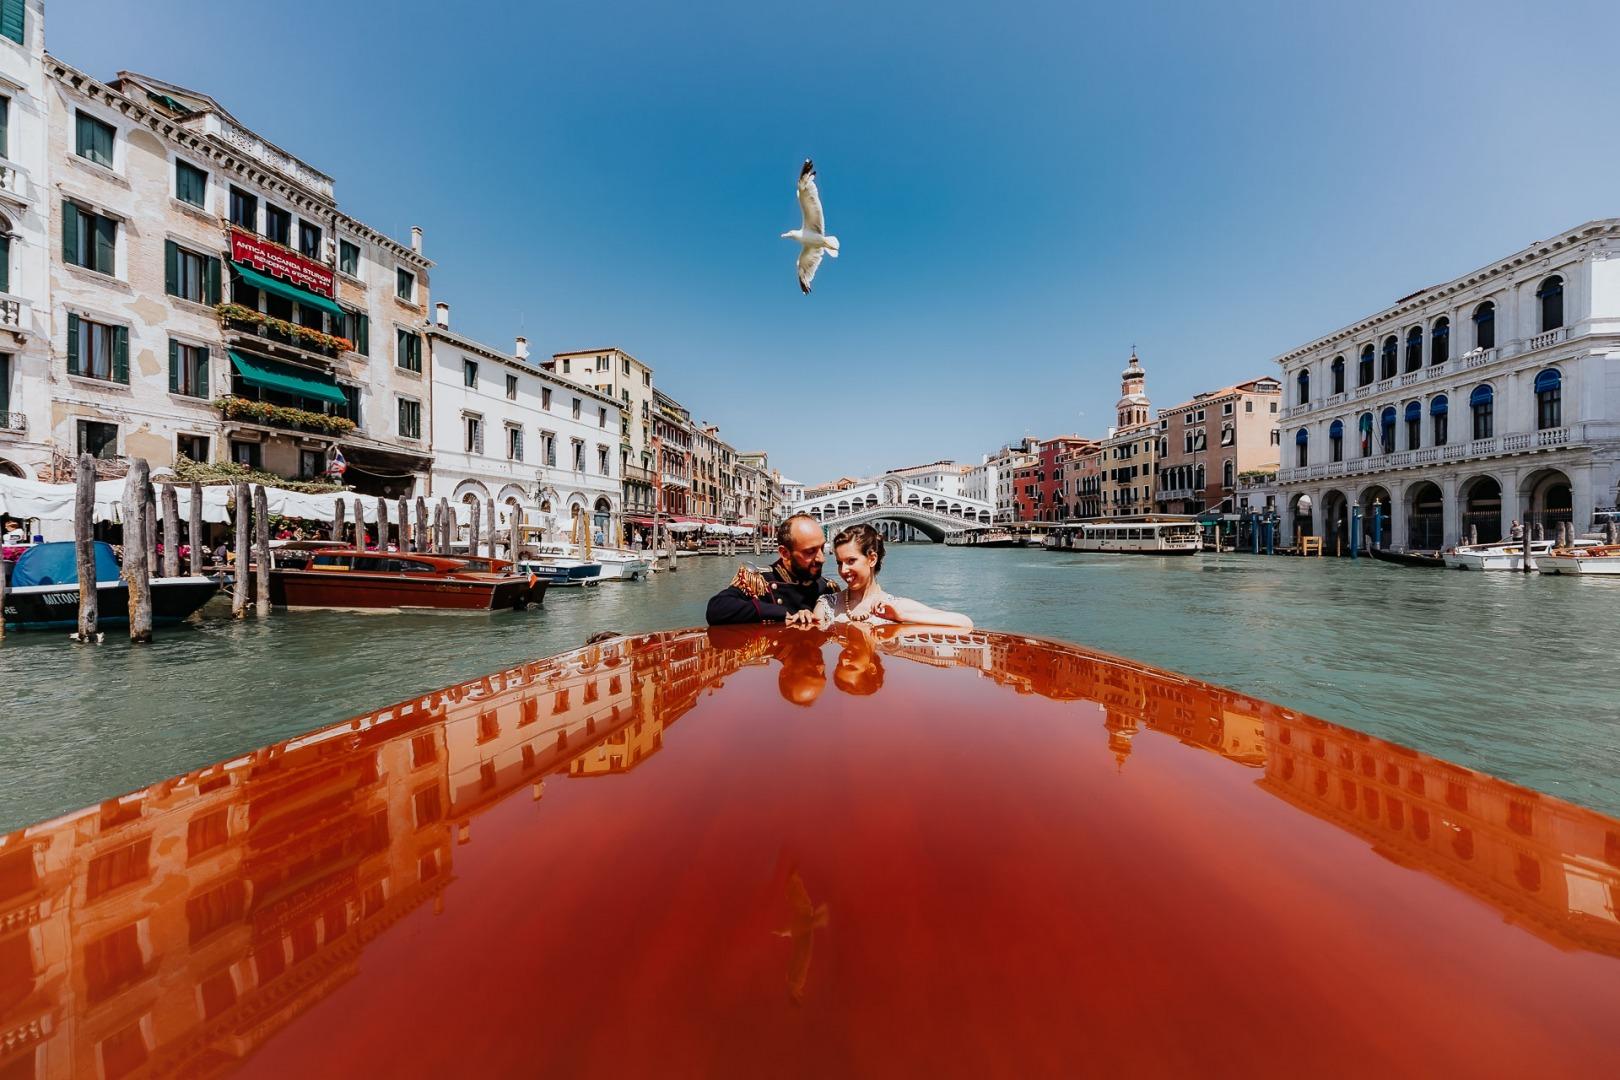 NicolaDaLio-Venezia-Rist_Dei_Contorni-124